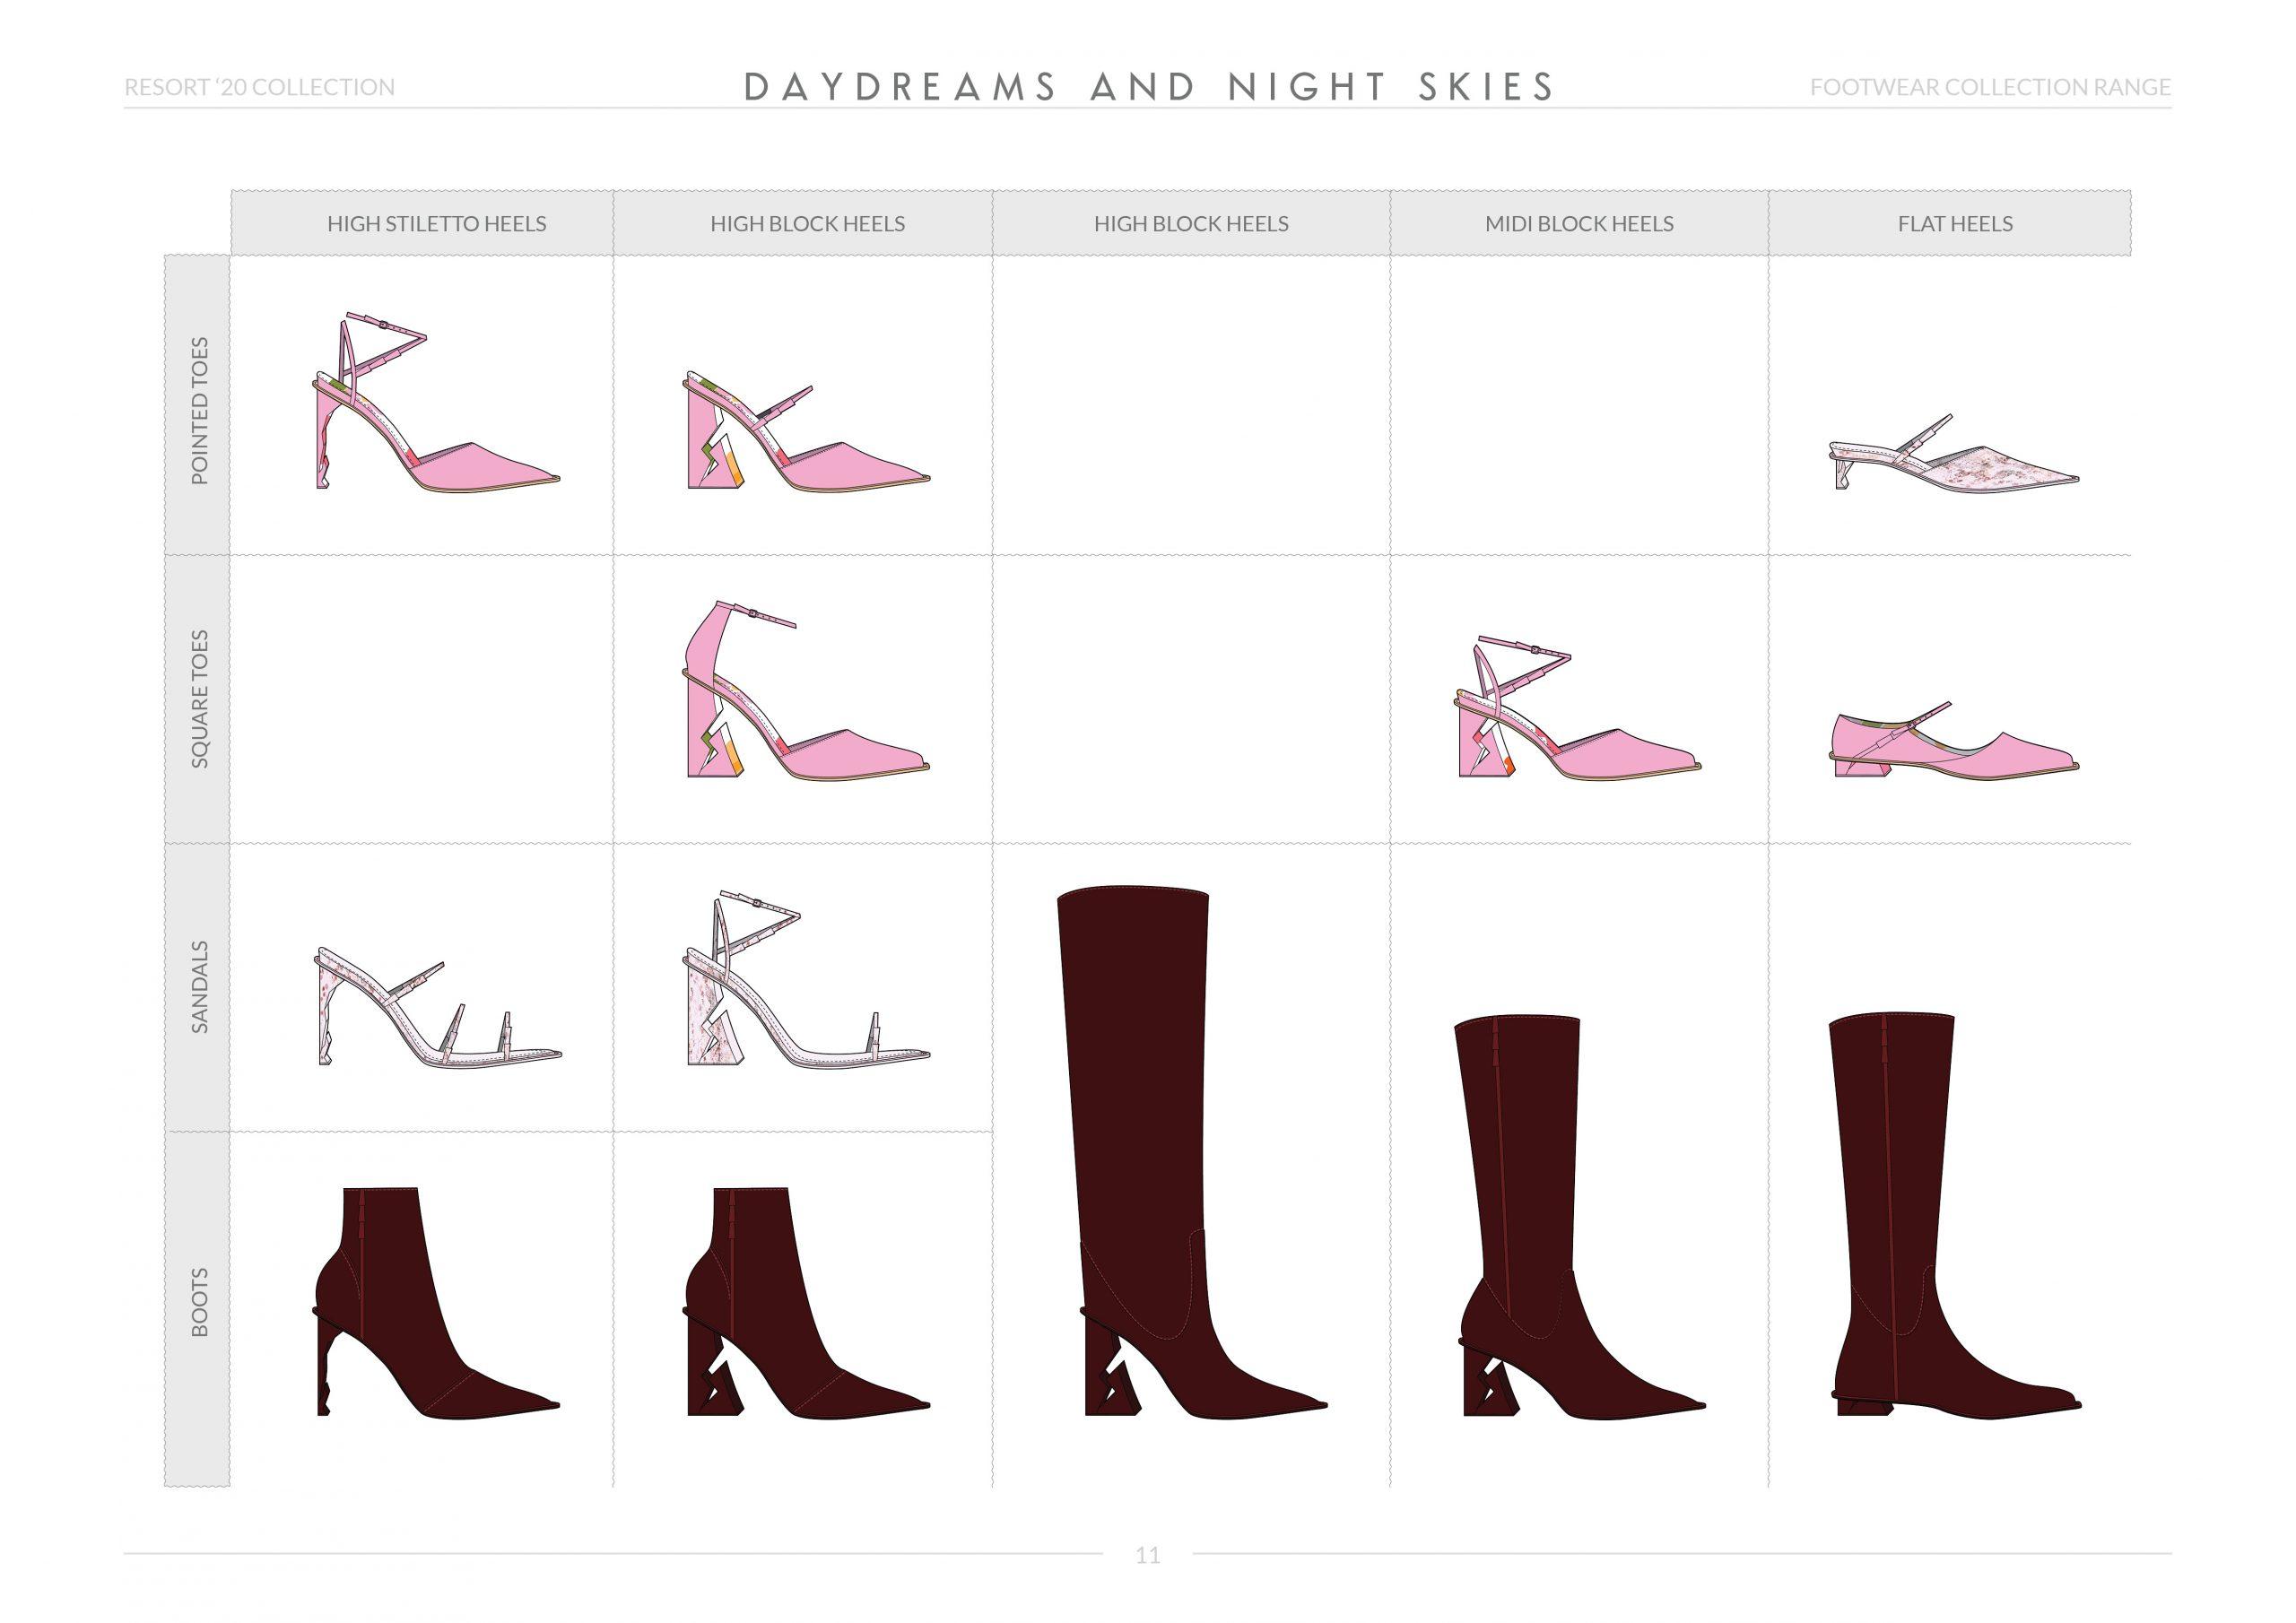 Resort-20 Womens Footwear Collection Range